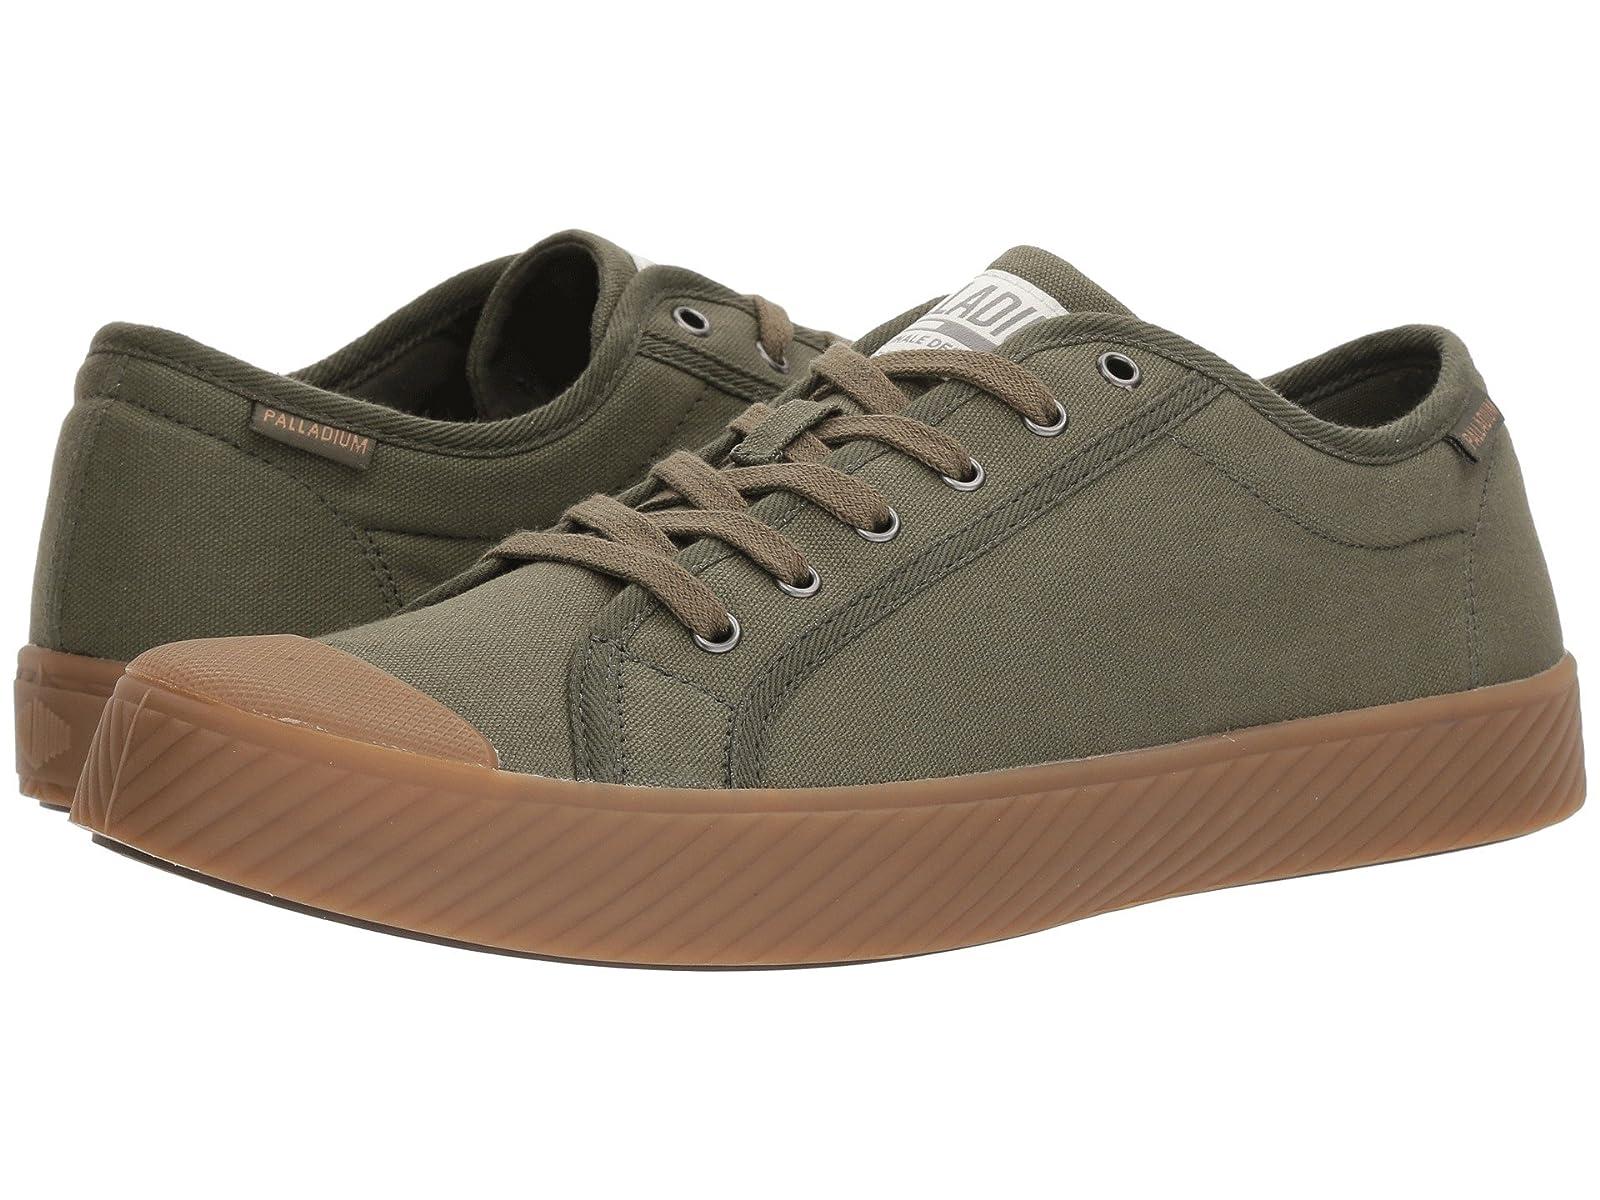 Palladium Pallaphoenix OG CVSAtmospheric grades have affordable shoes